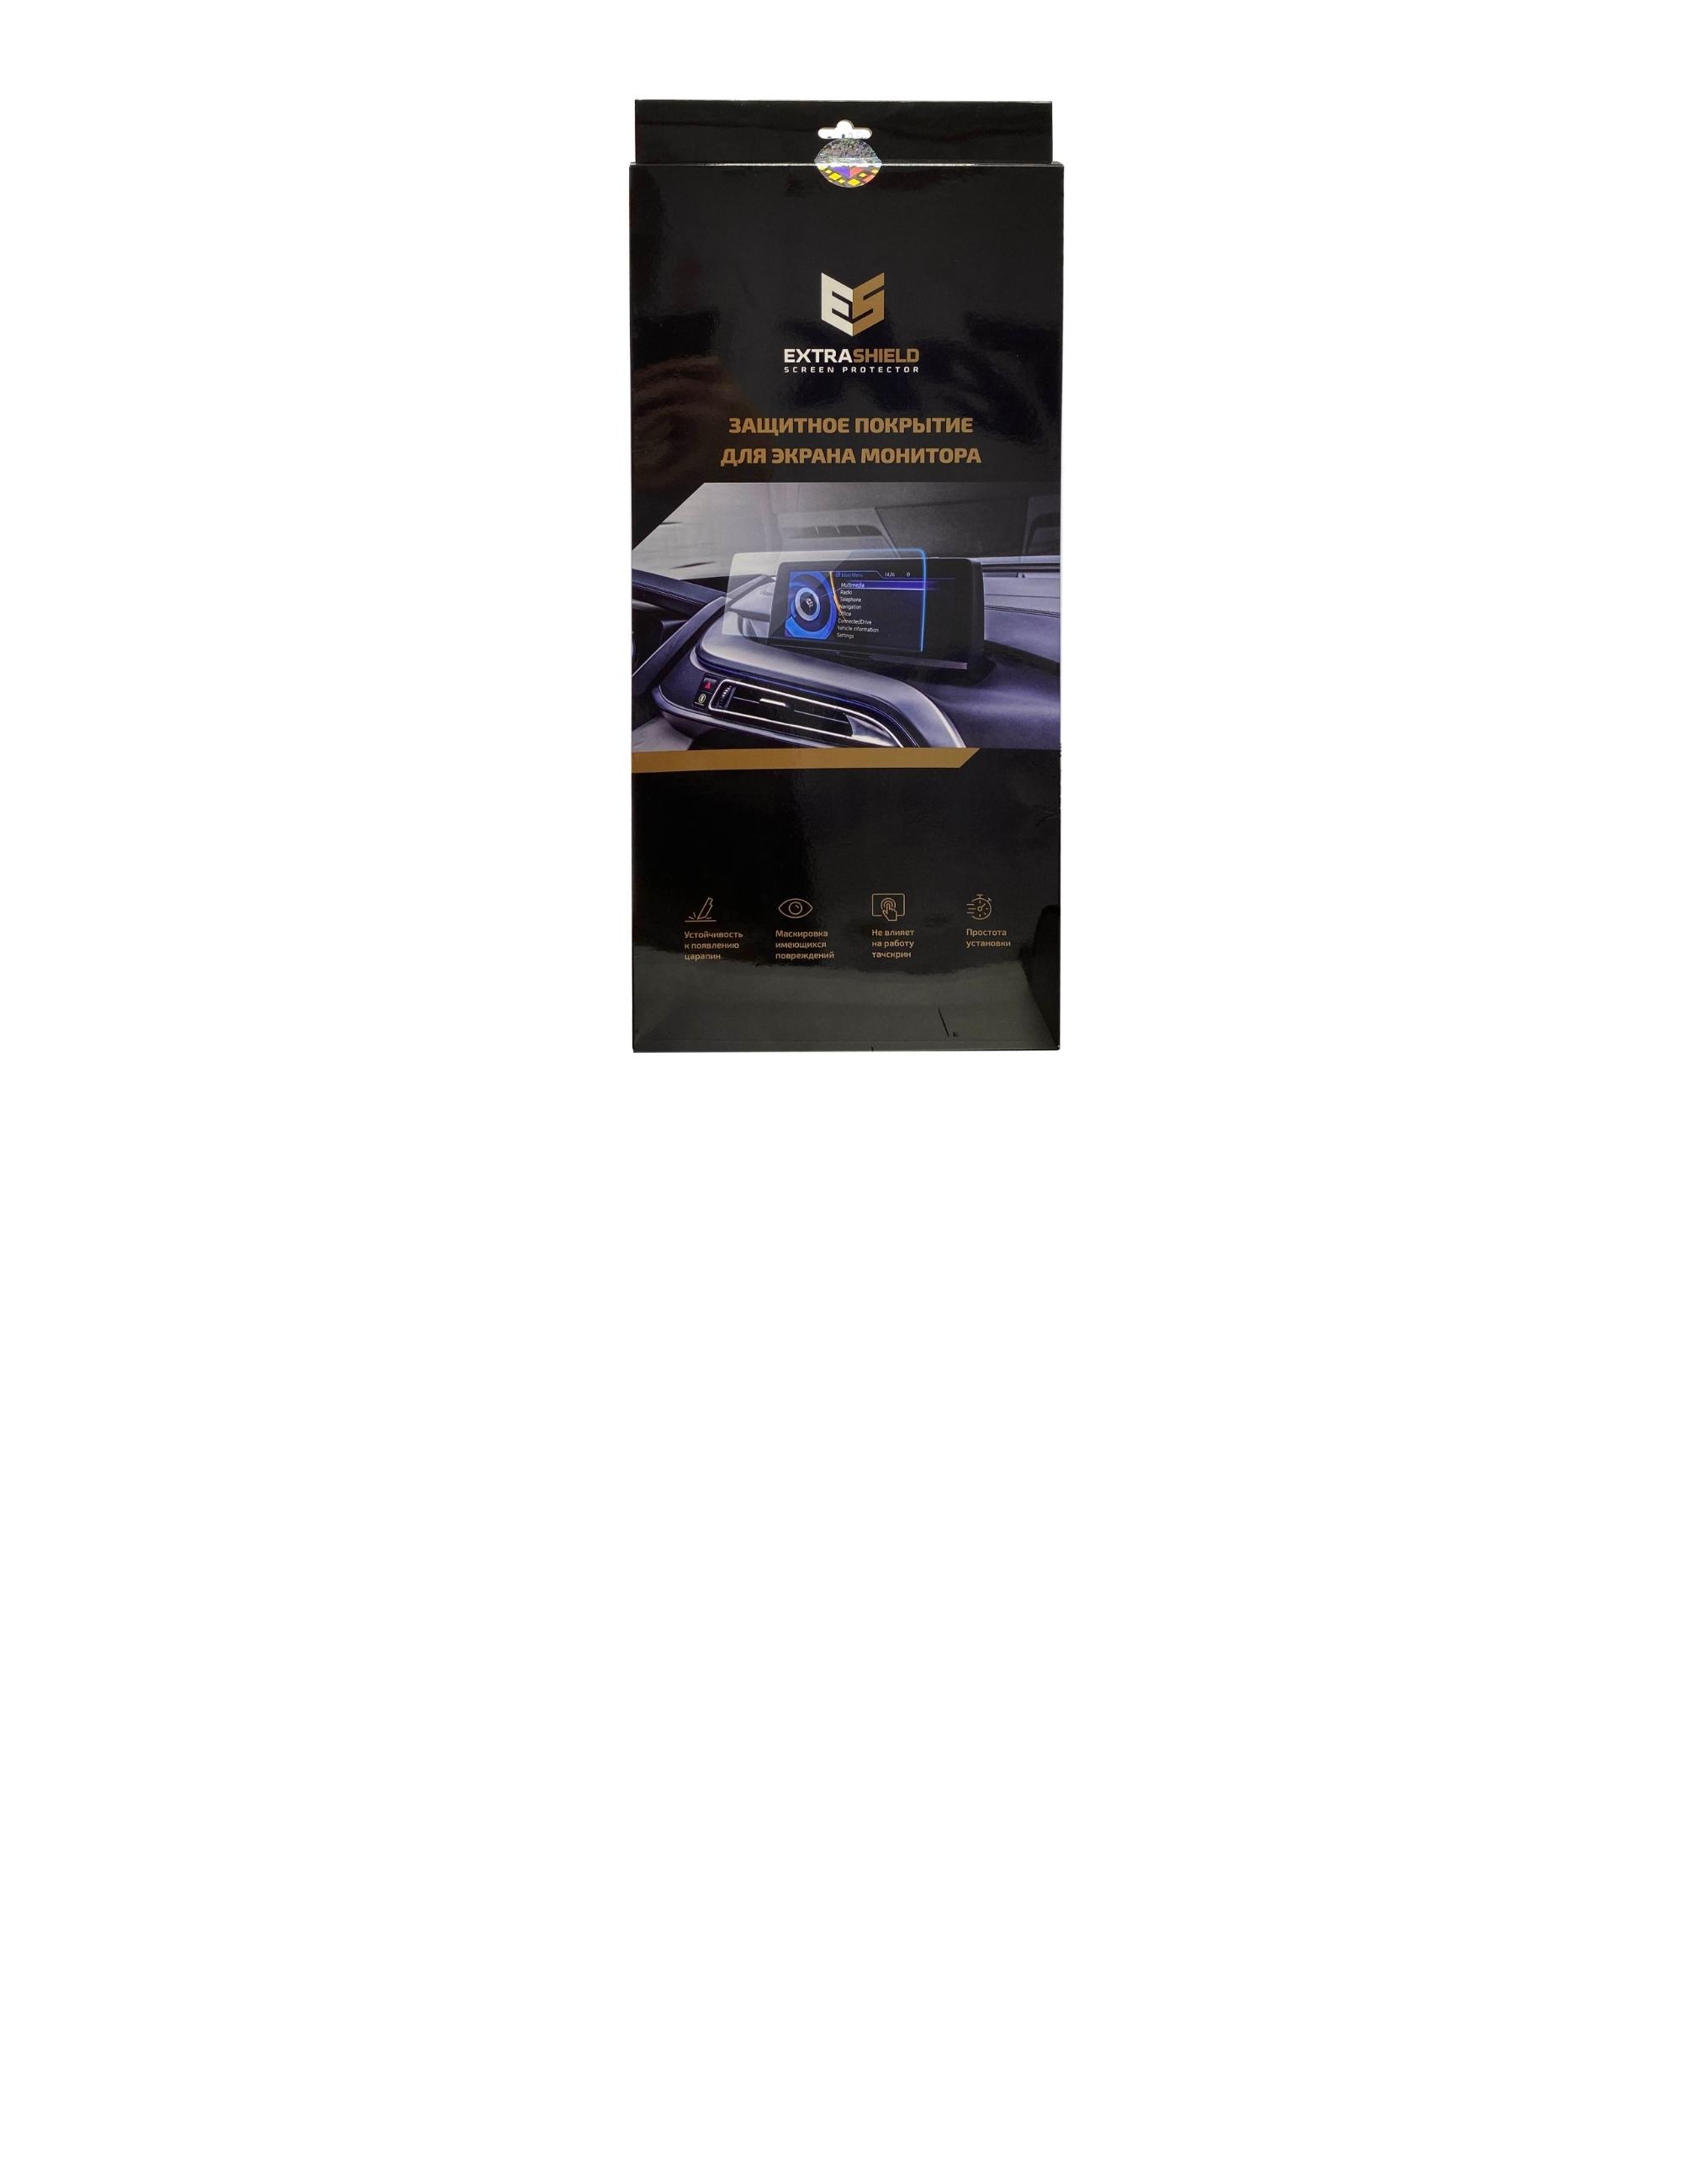 Mercedes-Benz A-class (W177) 2018 - н.в. приборная панель+мультимедиа 10,25 Защитное стекло Матовая